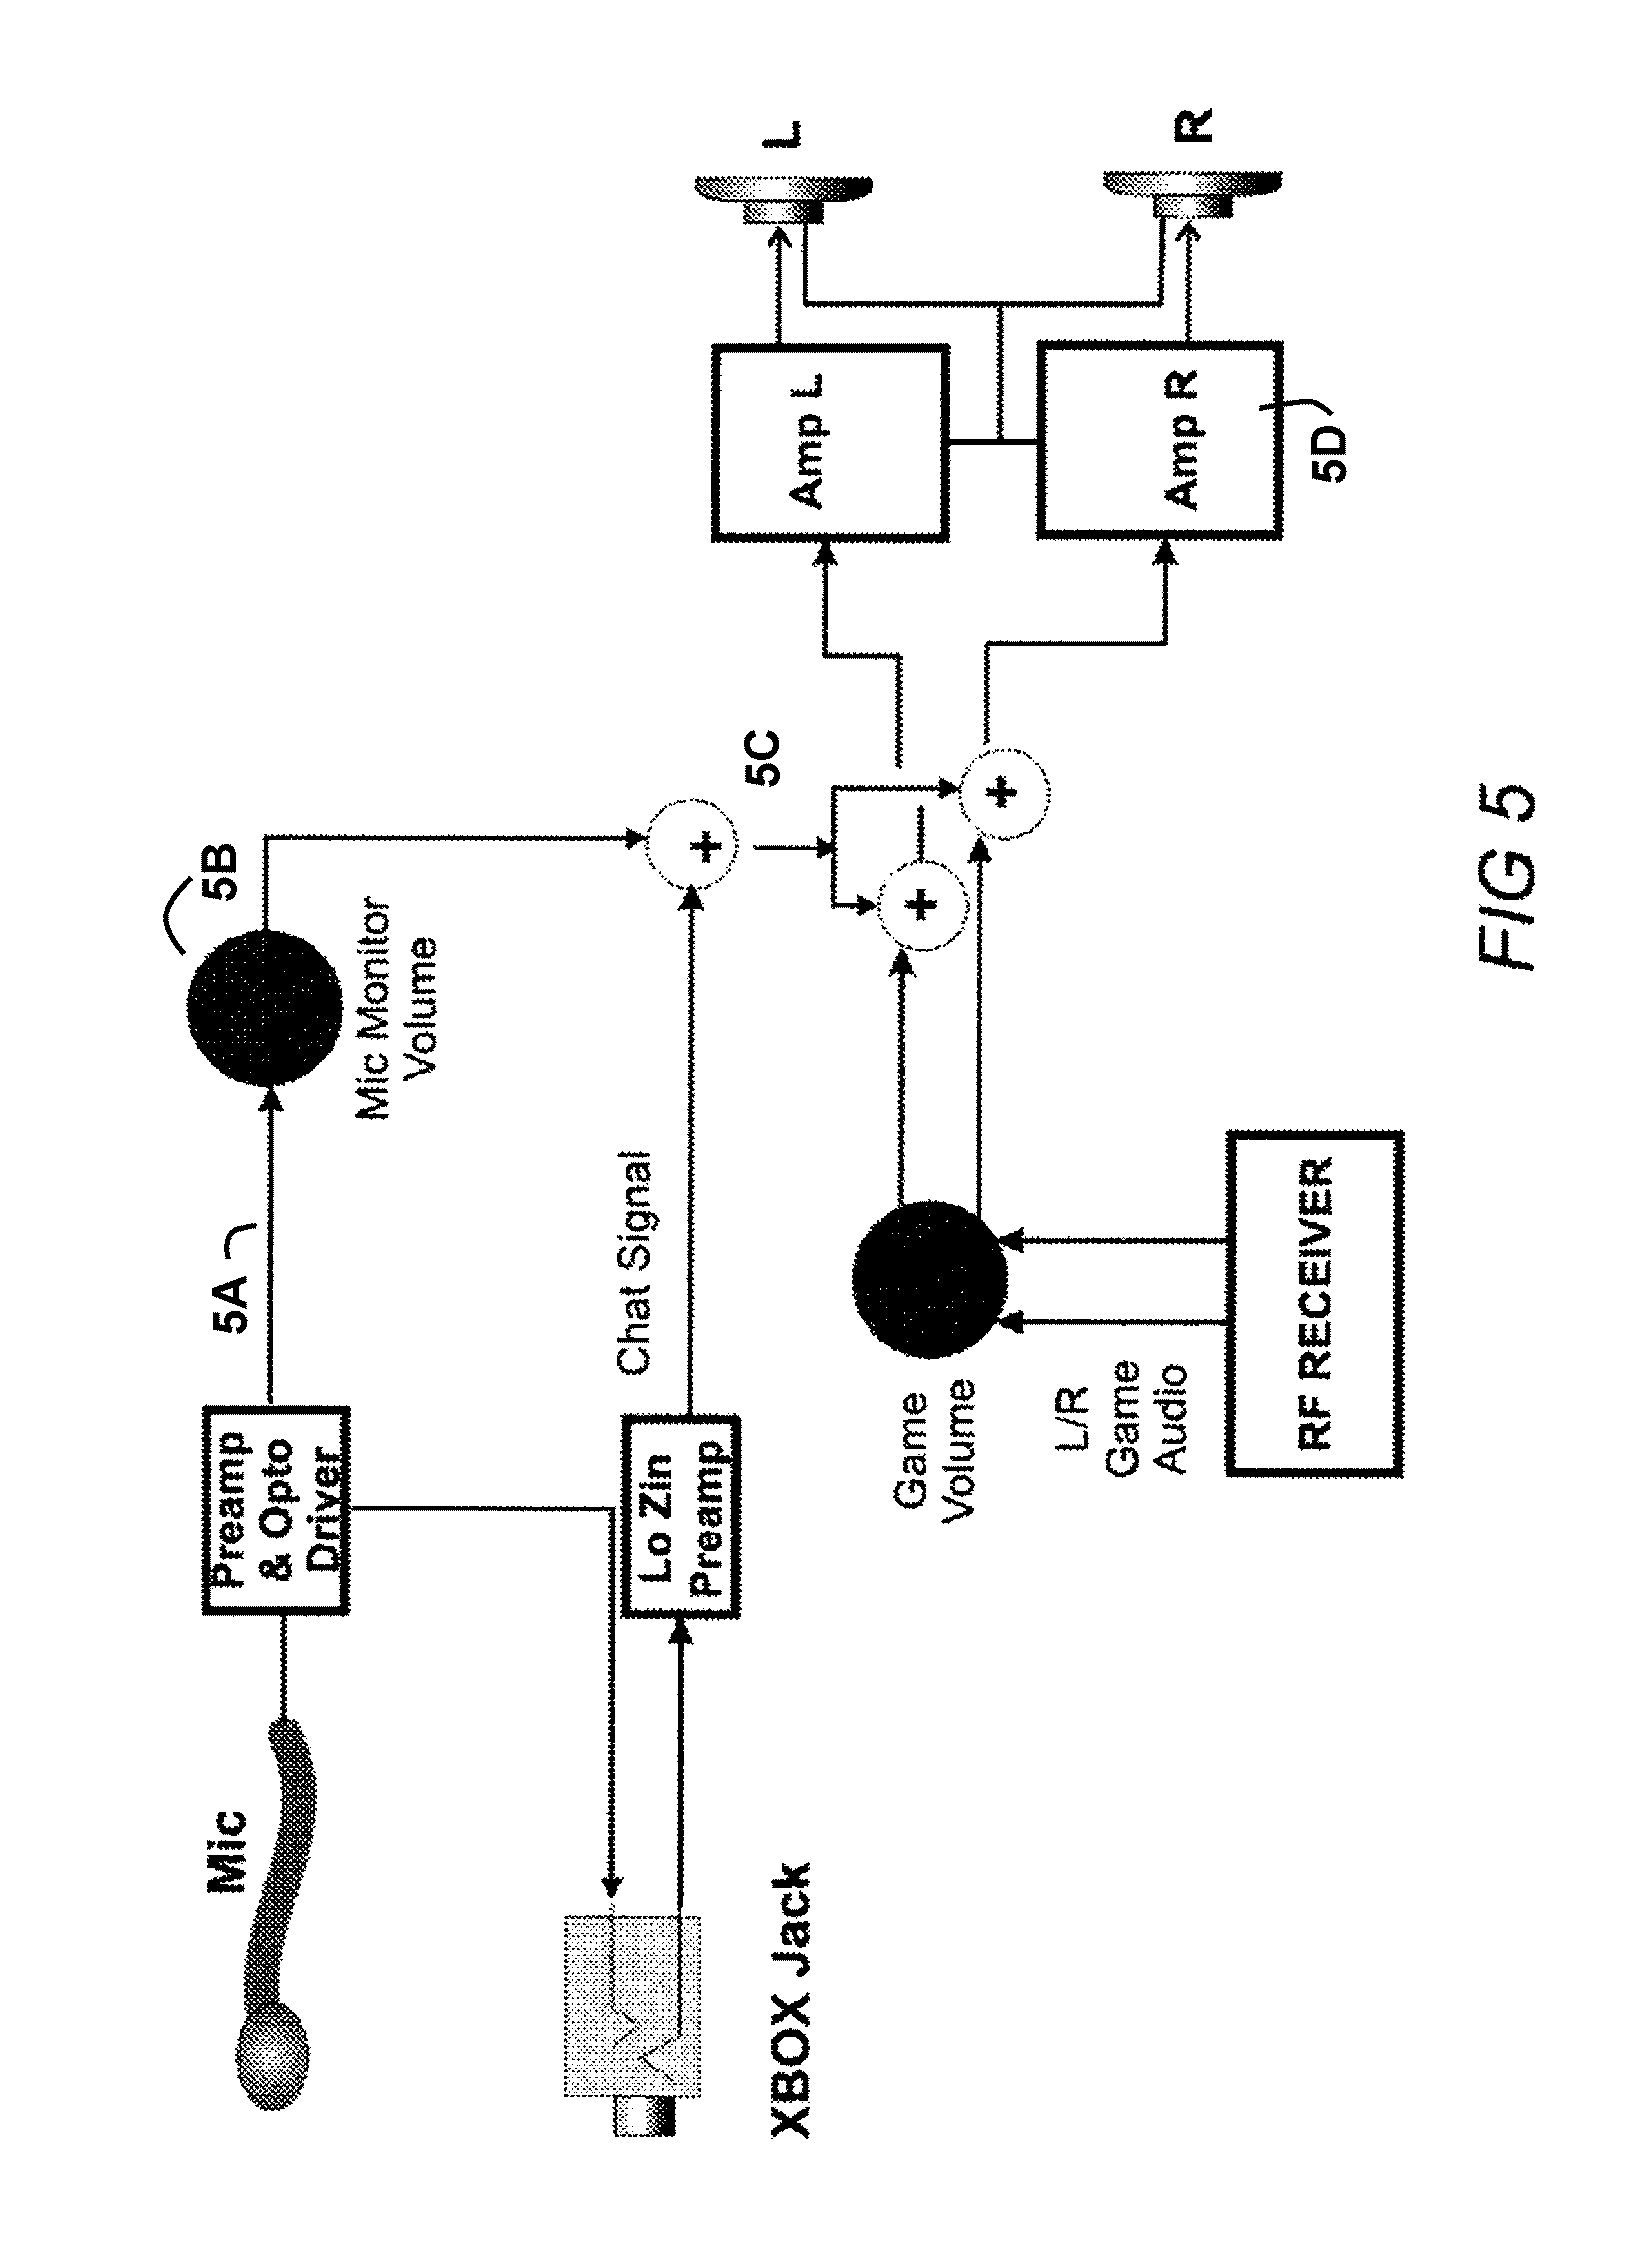 Diagrama Cummins additionally Specs in addition A127 Alternator Wiring Diagram further 296959 also Lucas Alternator Wiring Diagram. on prestolite alternator wiring